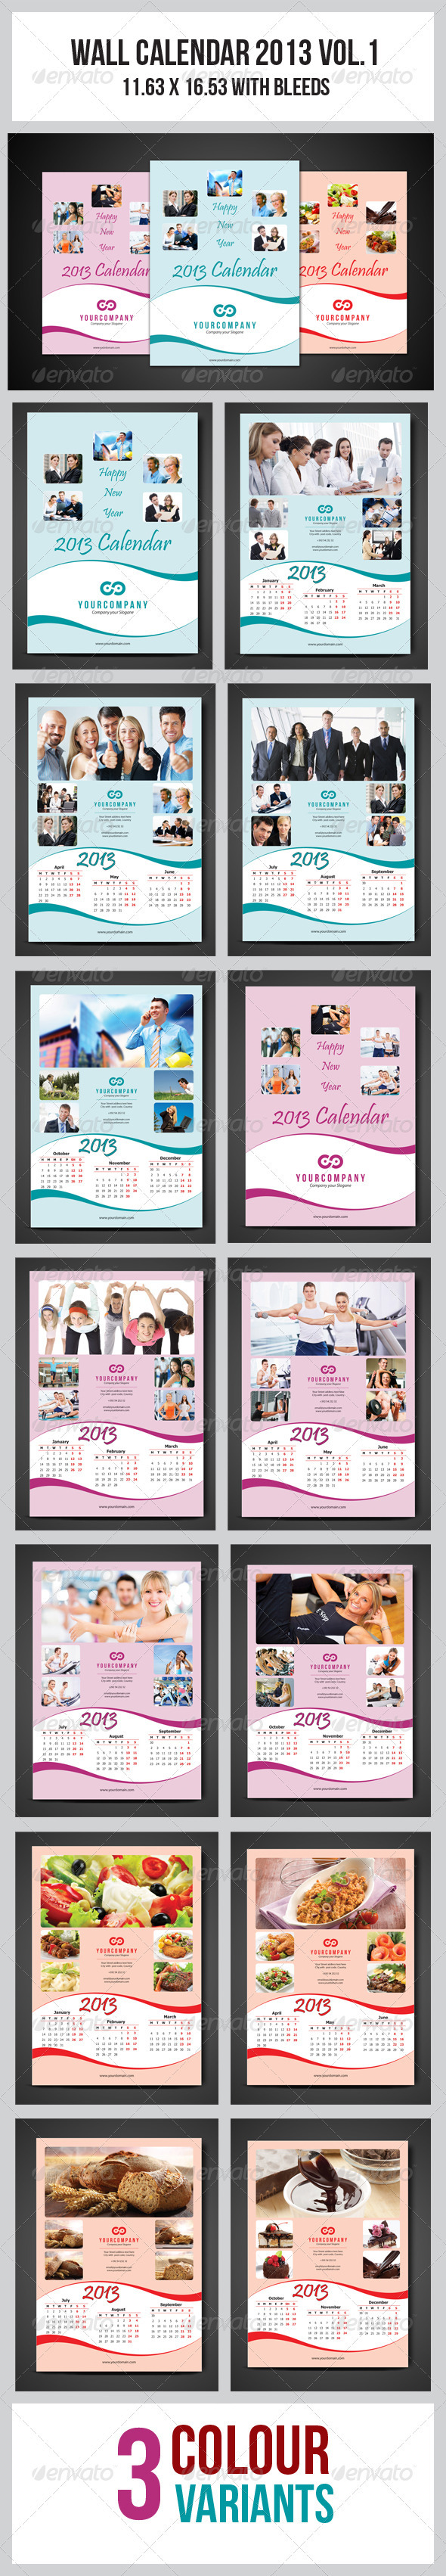 Wall Calendar 2013 Vol.1 - Calendars Stationery